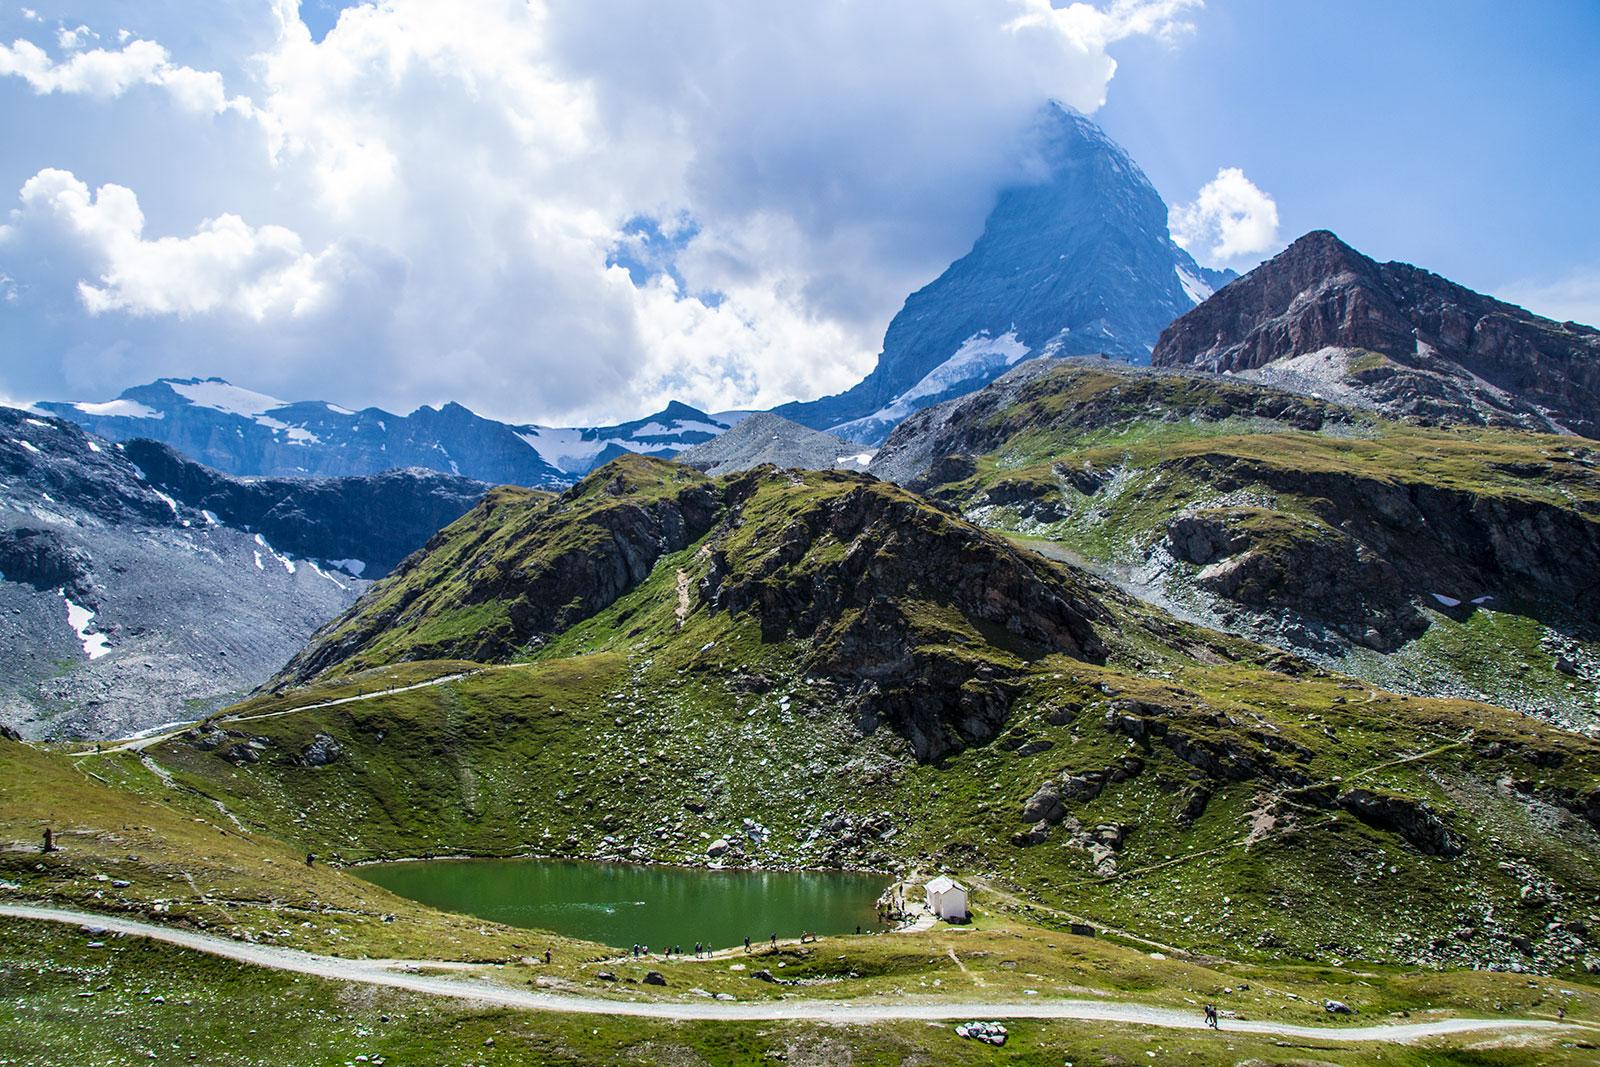 Lago Scharsee y Matterhorn - Matterhorn Glacier Paradise